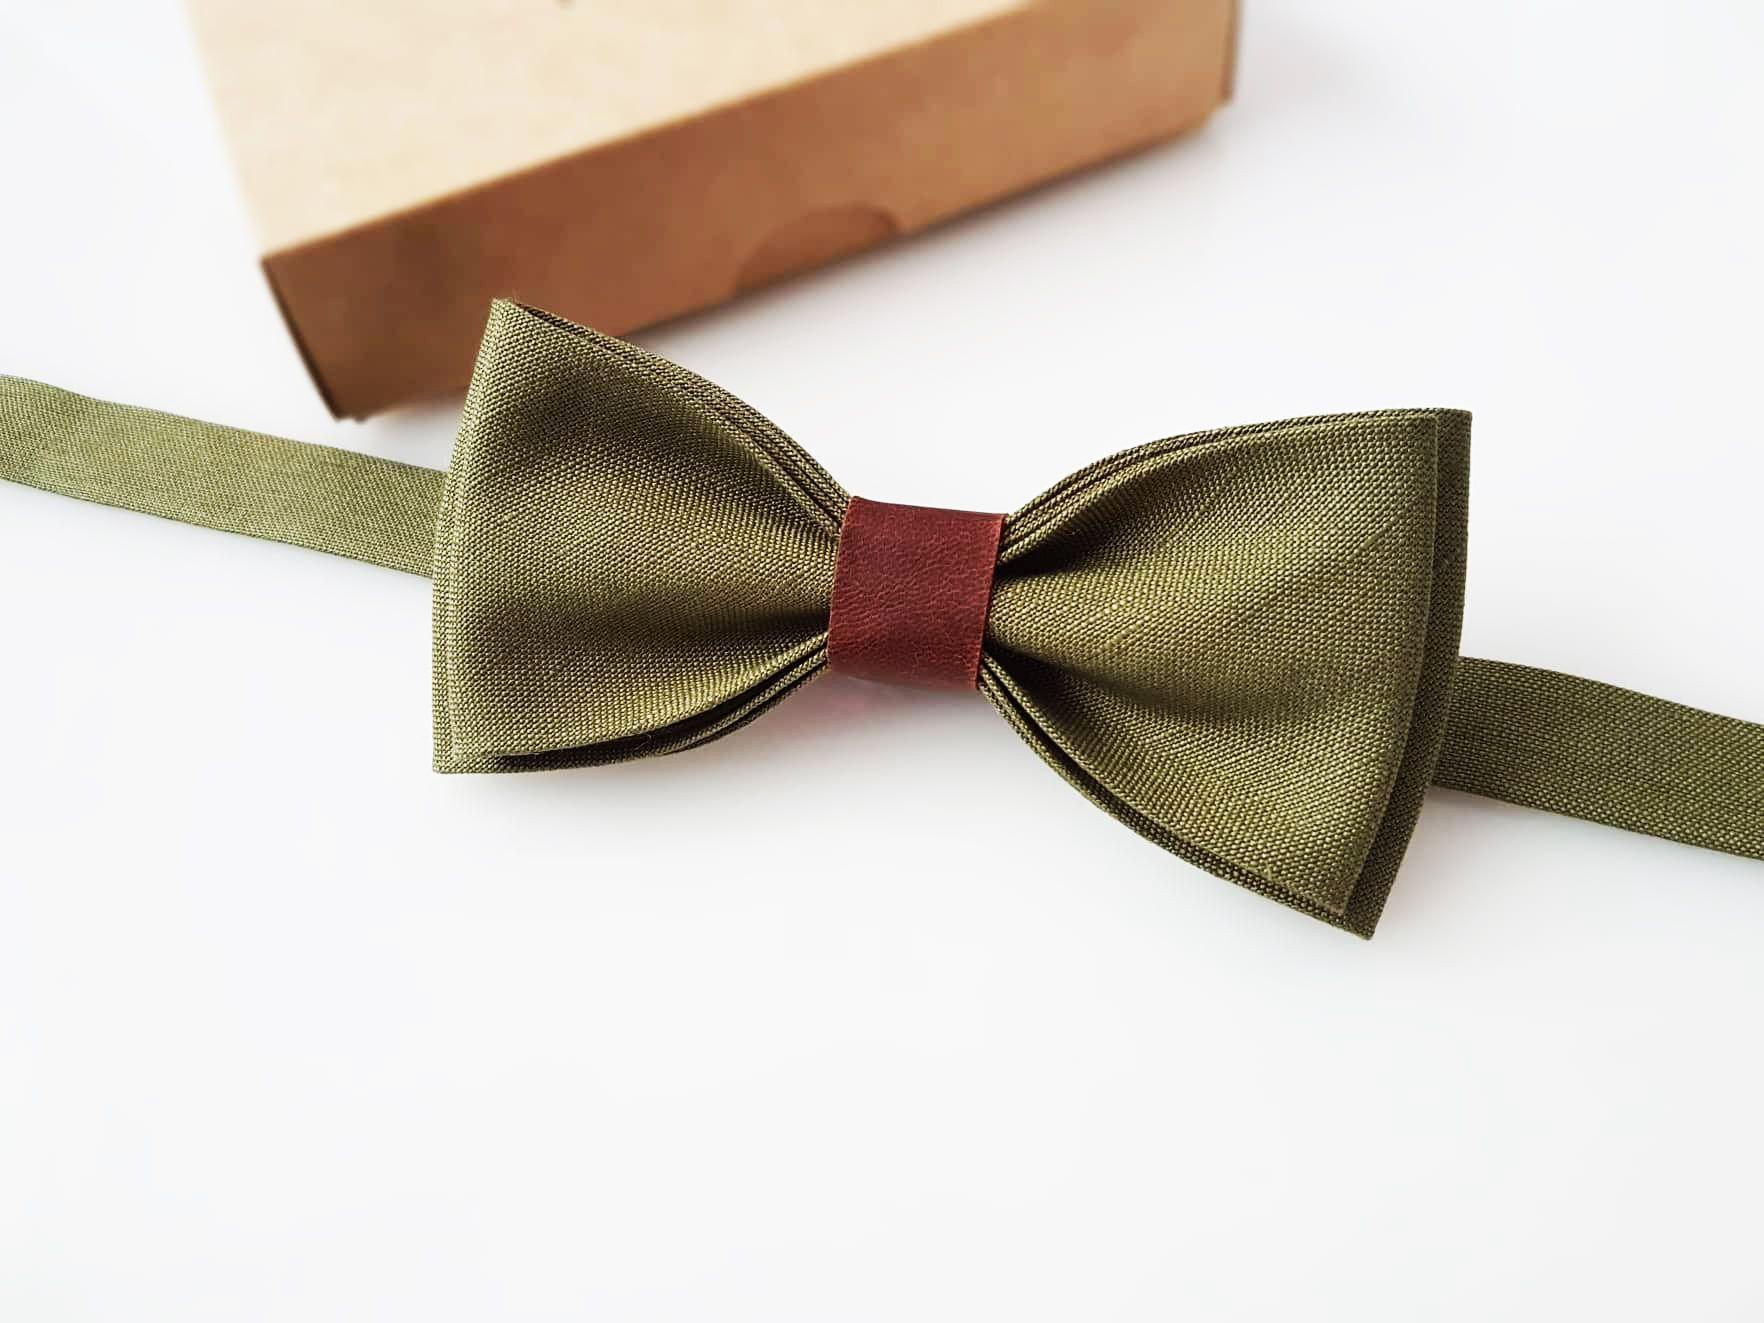 Brown Bow Tie Set Brown Wool Houndstooth Pre-Tied  Bow Tie Beige Pocket Square